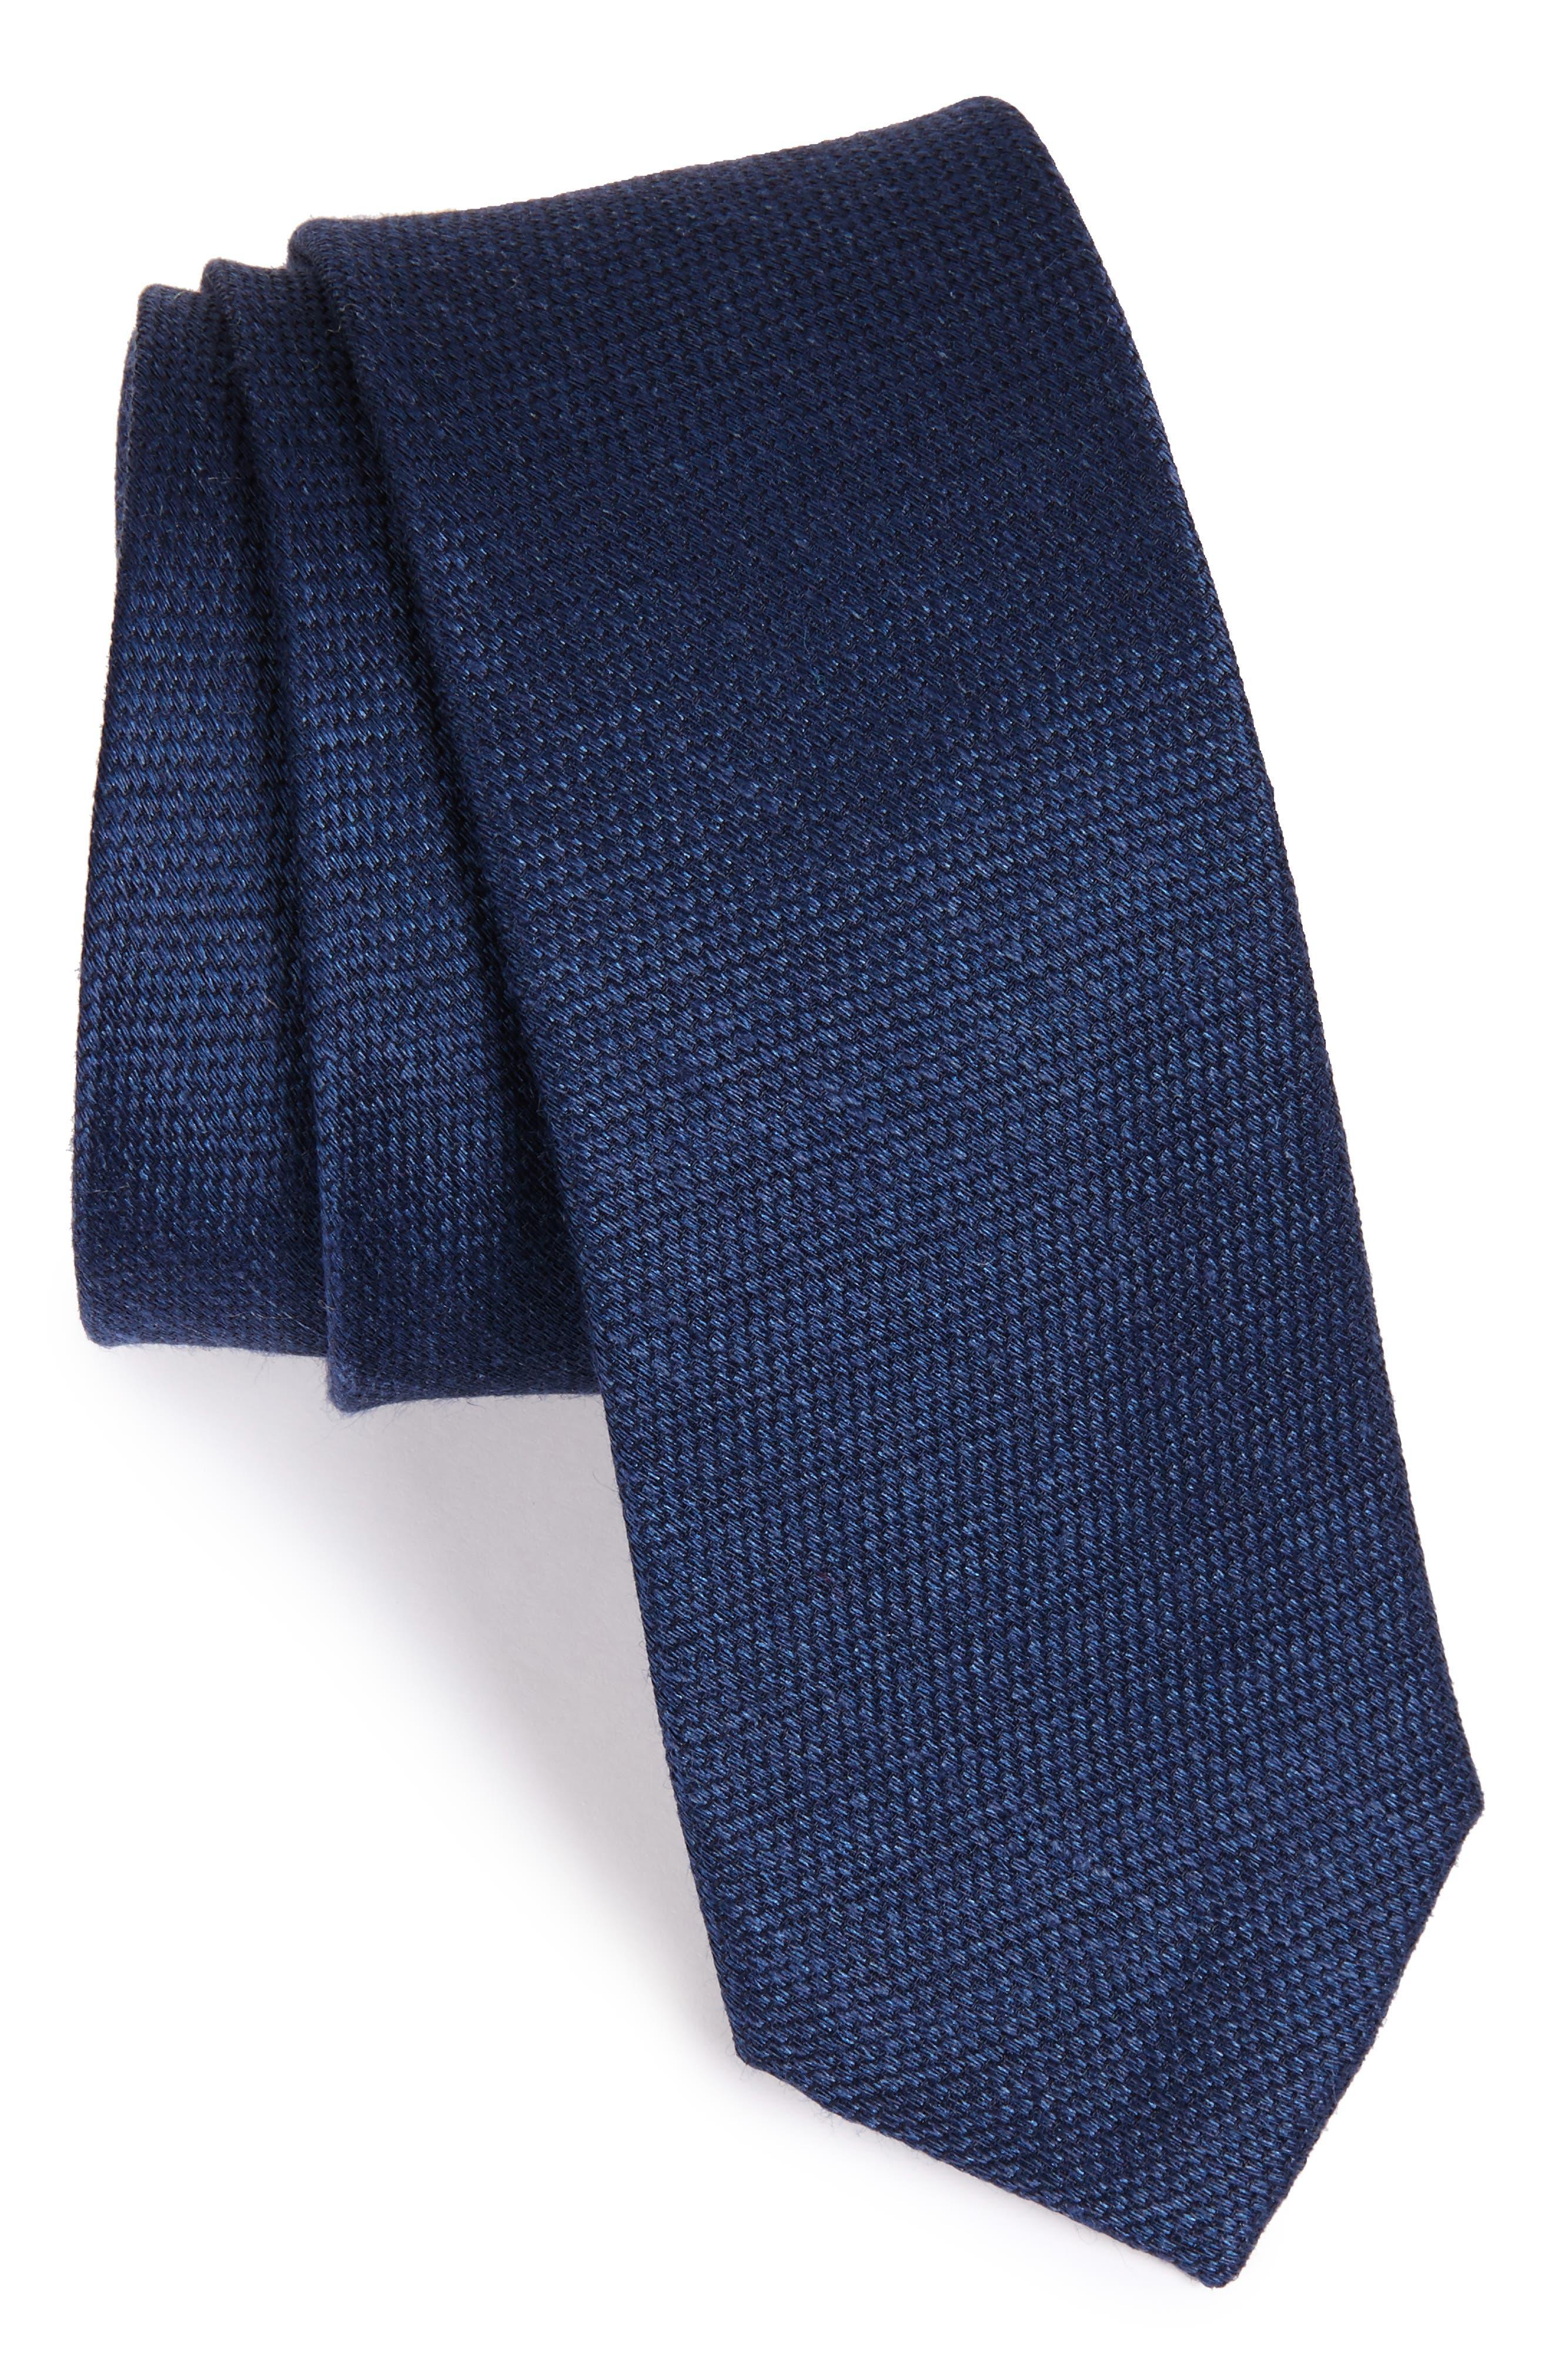 Alternate Image 1 Selected - The Tie Bar Solid Silk & Linen Tie